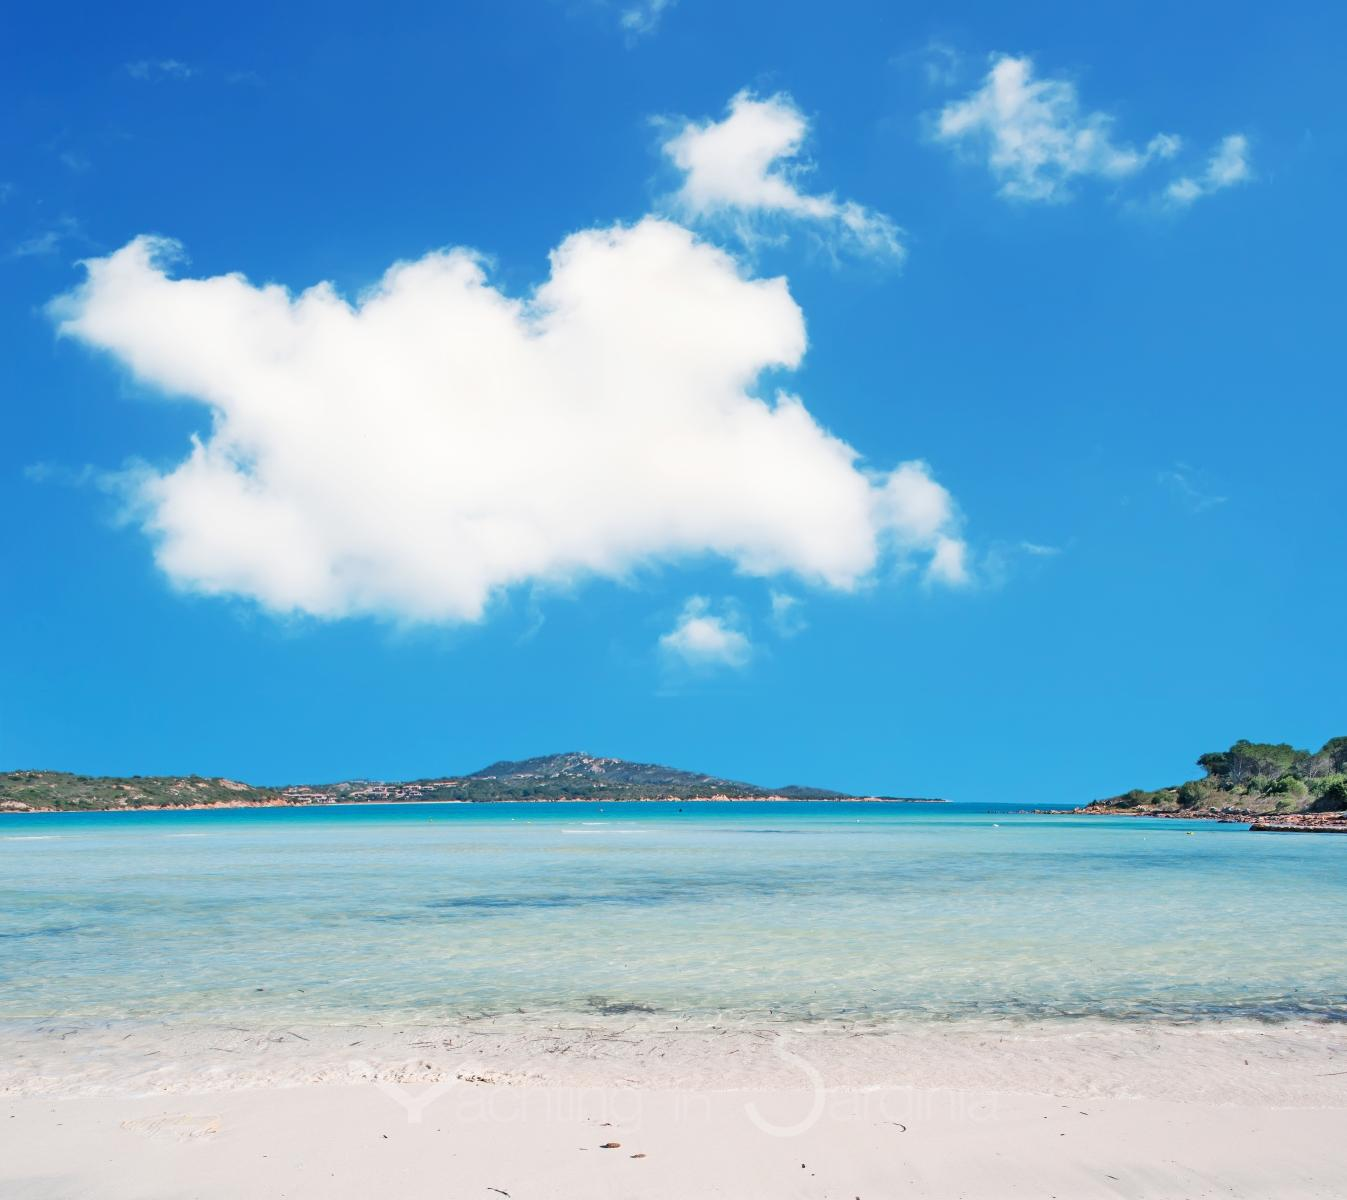 Carribean? Maldives? No…Sardinia!